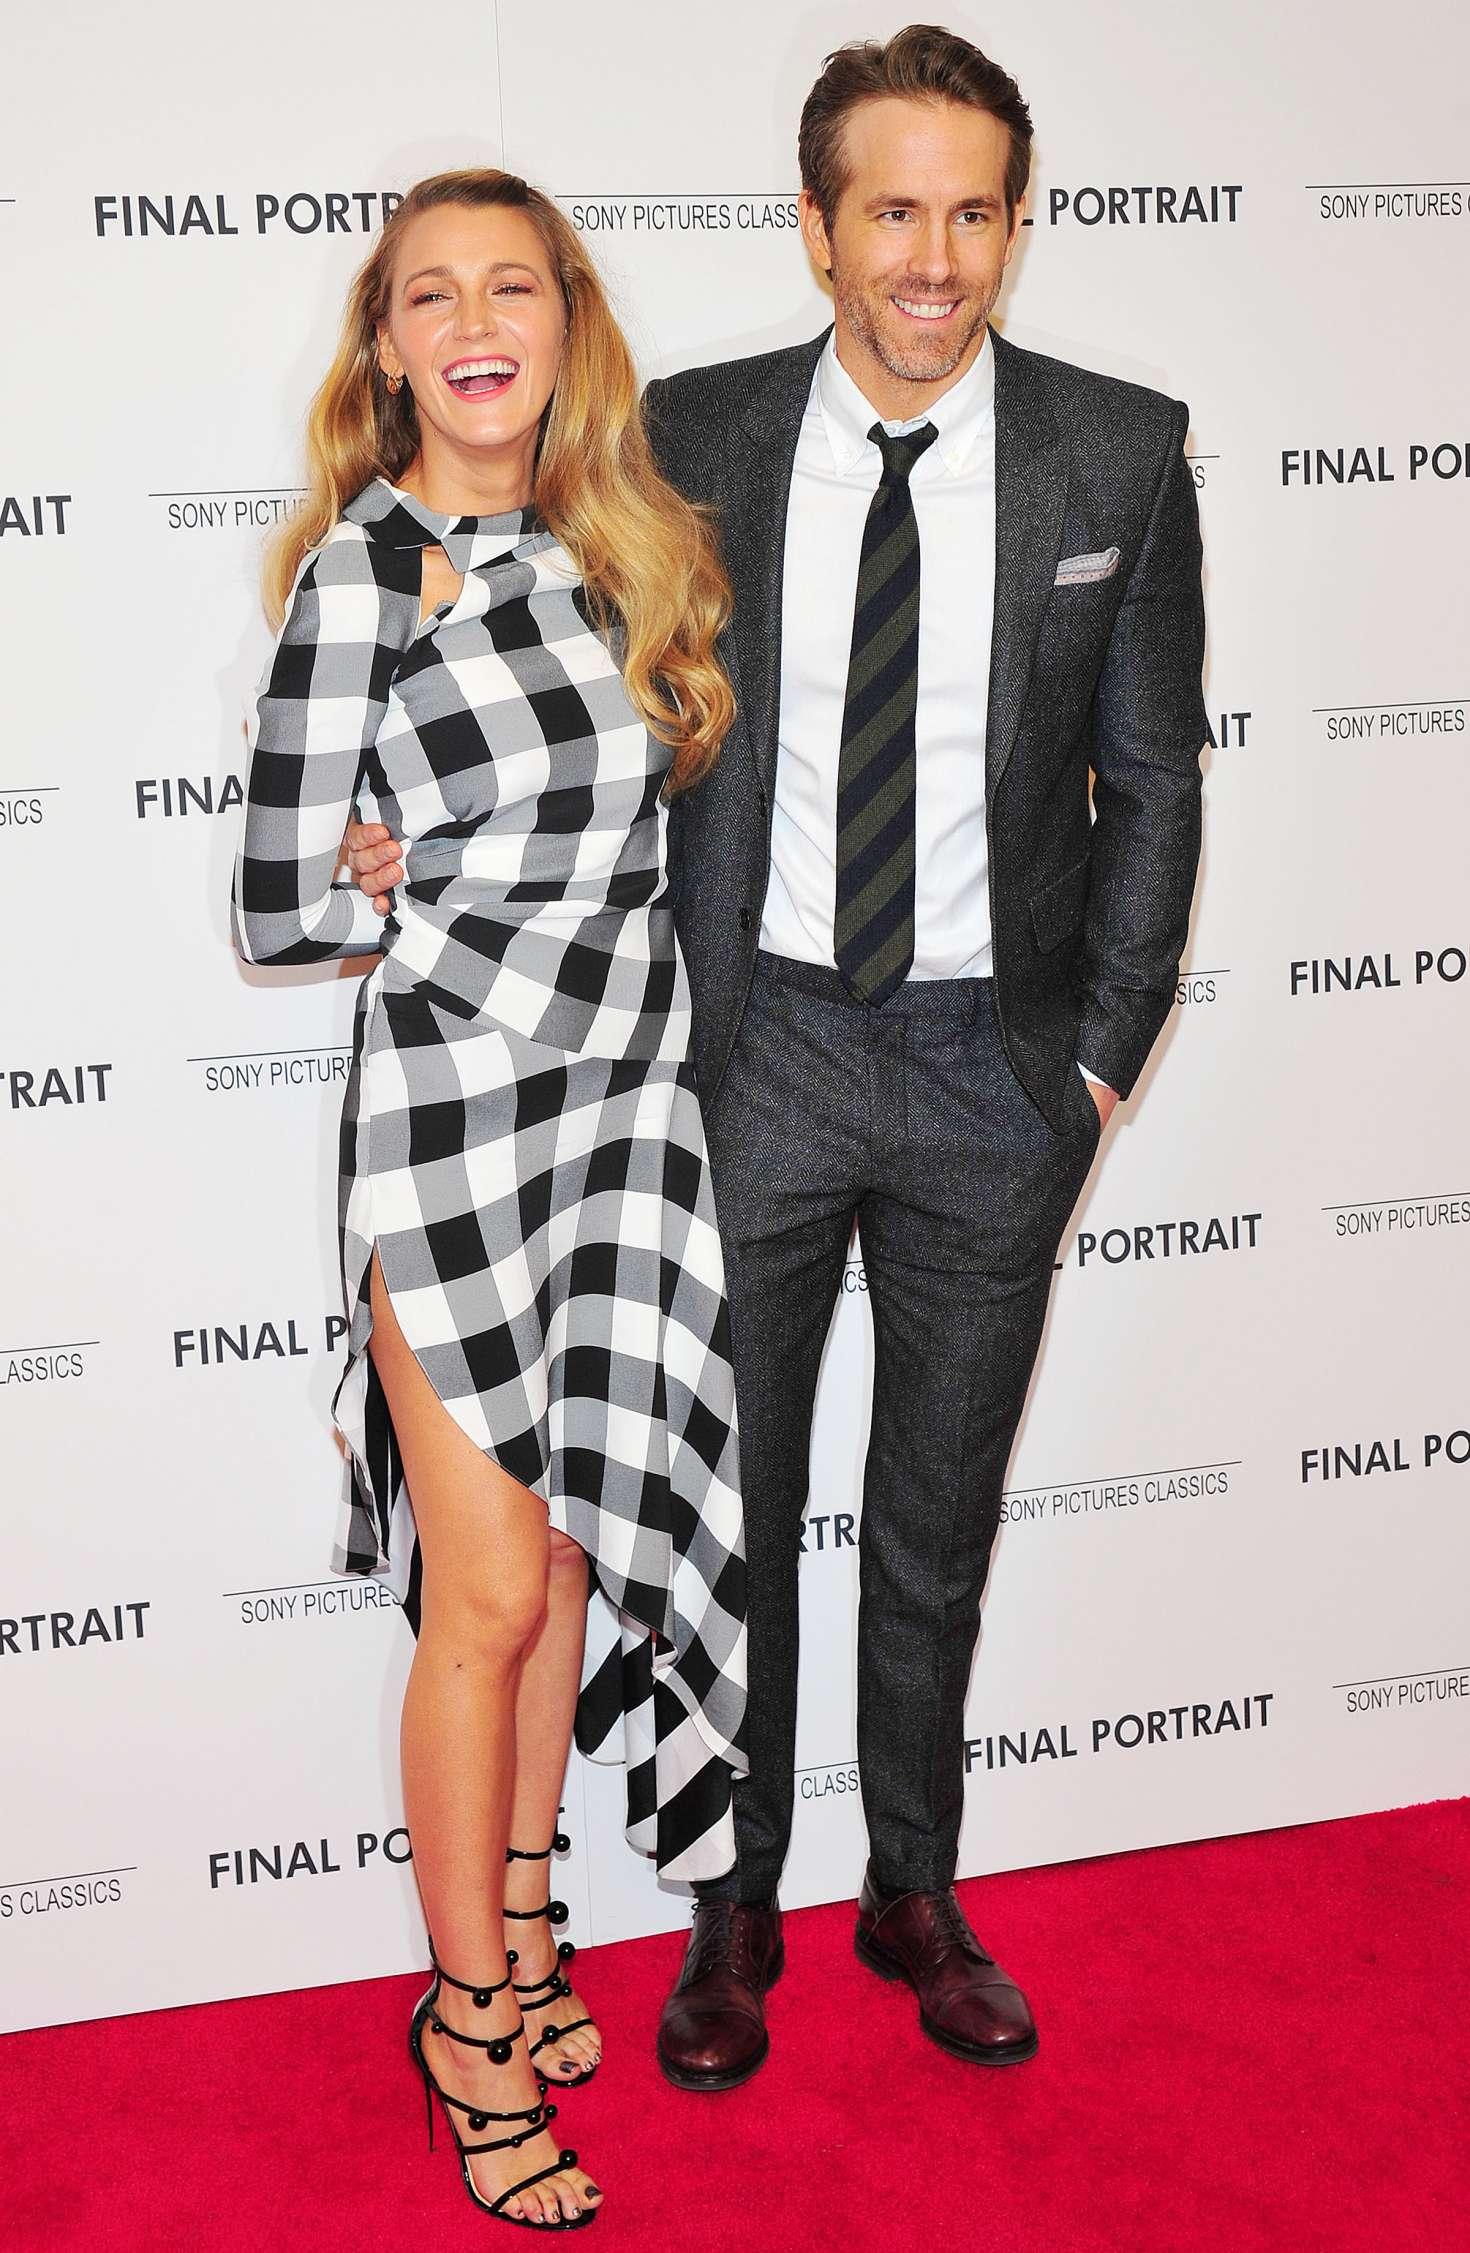 Blake Lively and Ryan Reynolds - 'Final Portrait' Screening in New York City